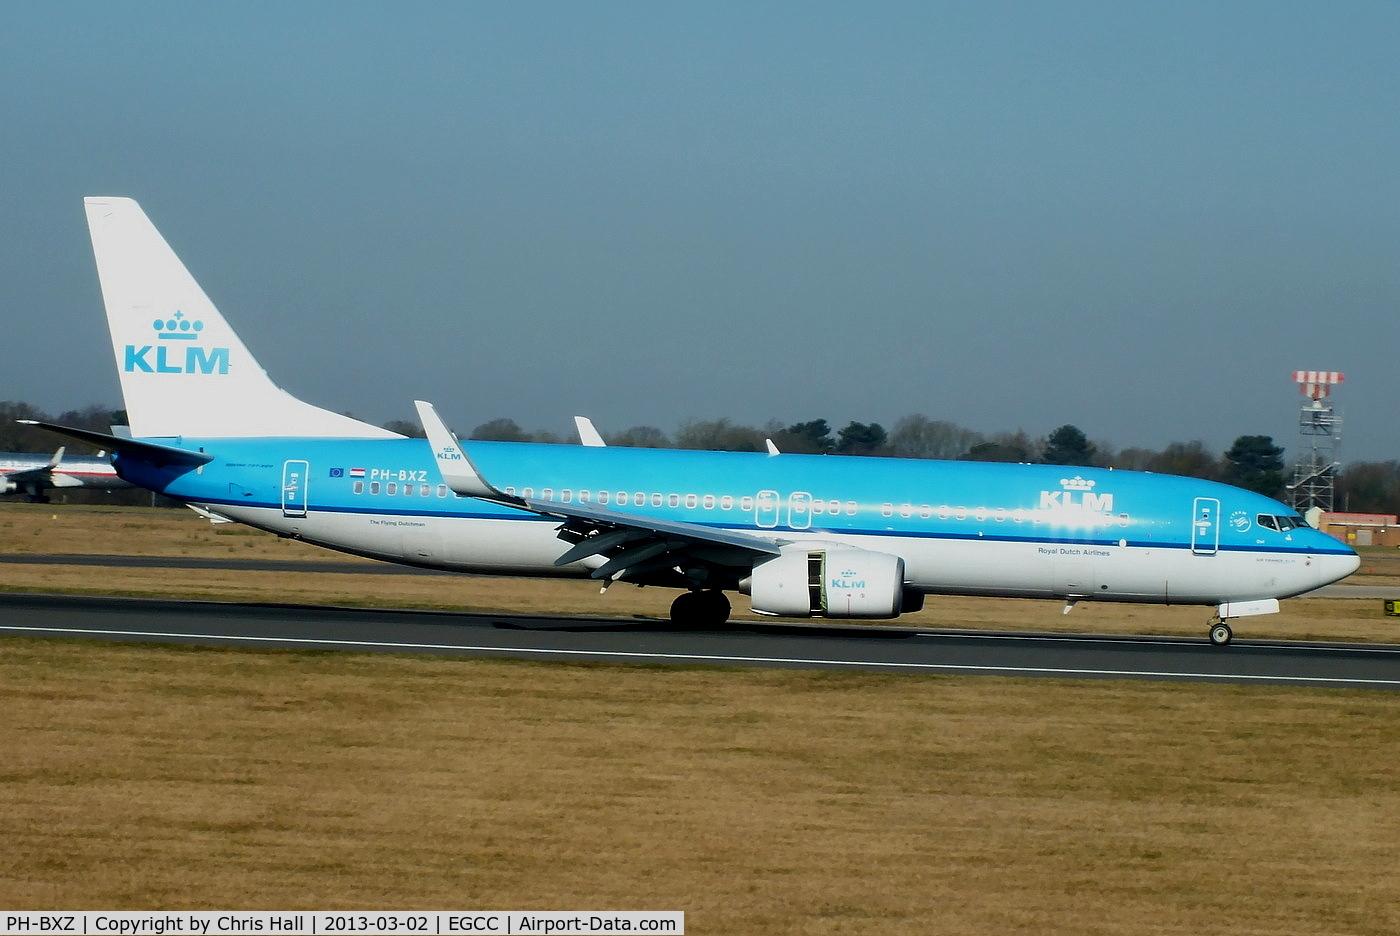 PH-BXZ, 2008 Boeing 737-8K2 C/N 30368, KLM Royal Dutch Airlines